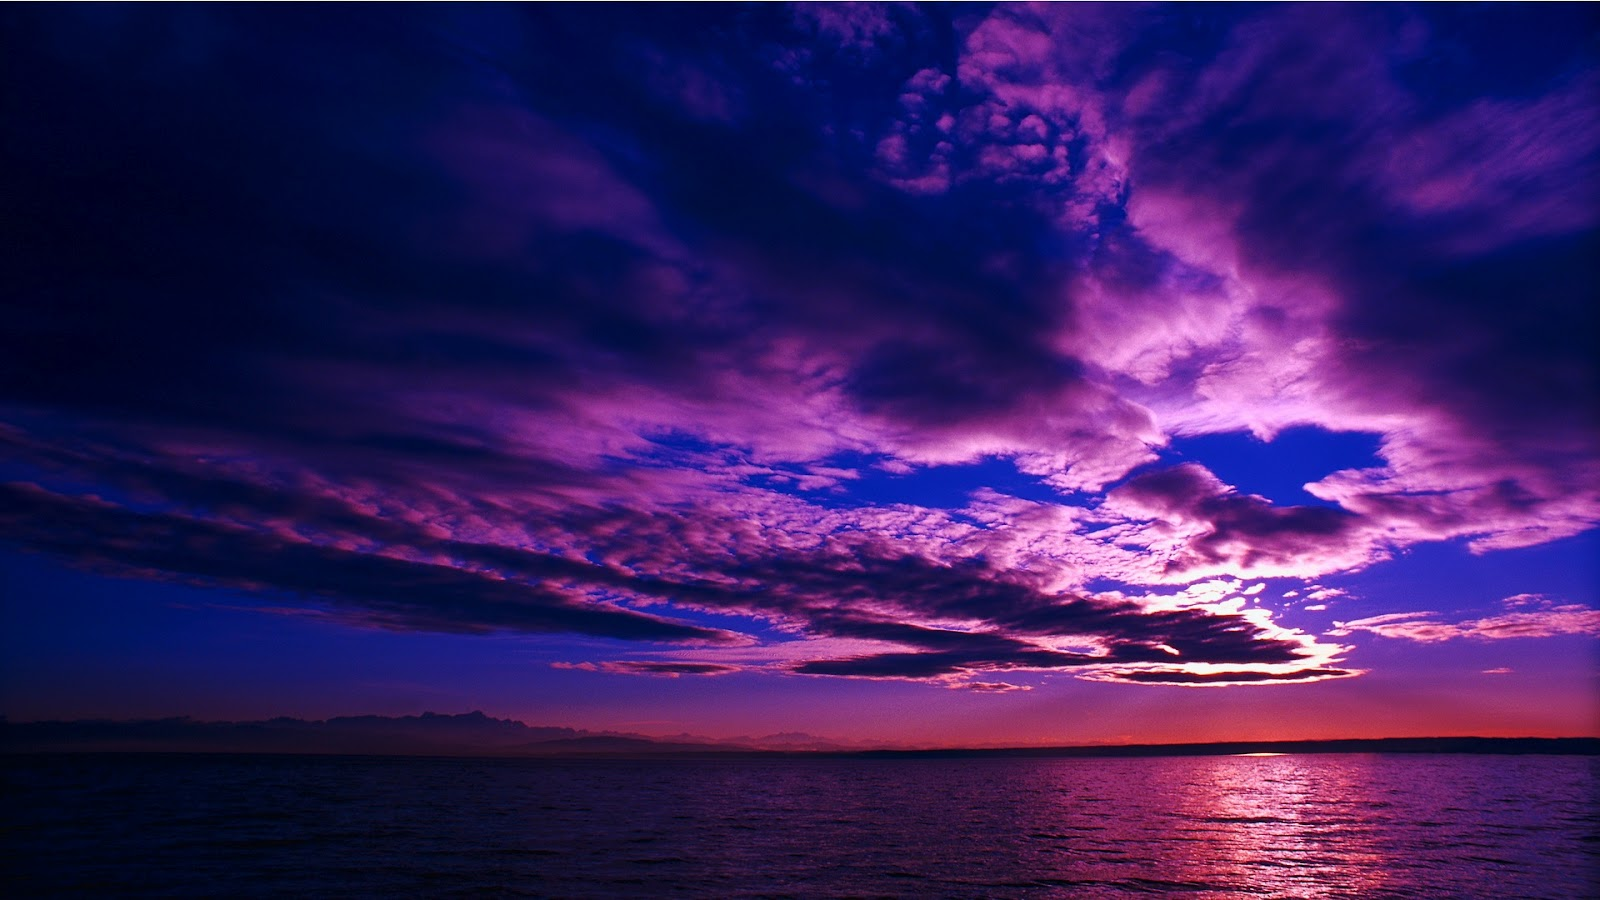 purple wallpaper 3 - photo #41